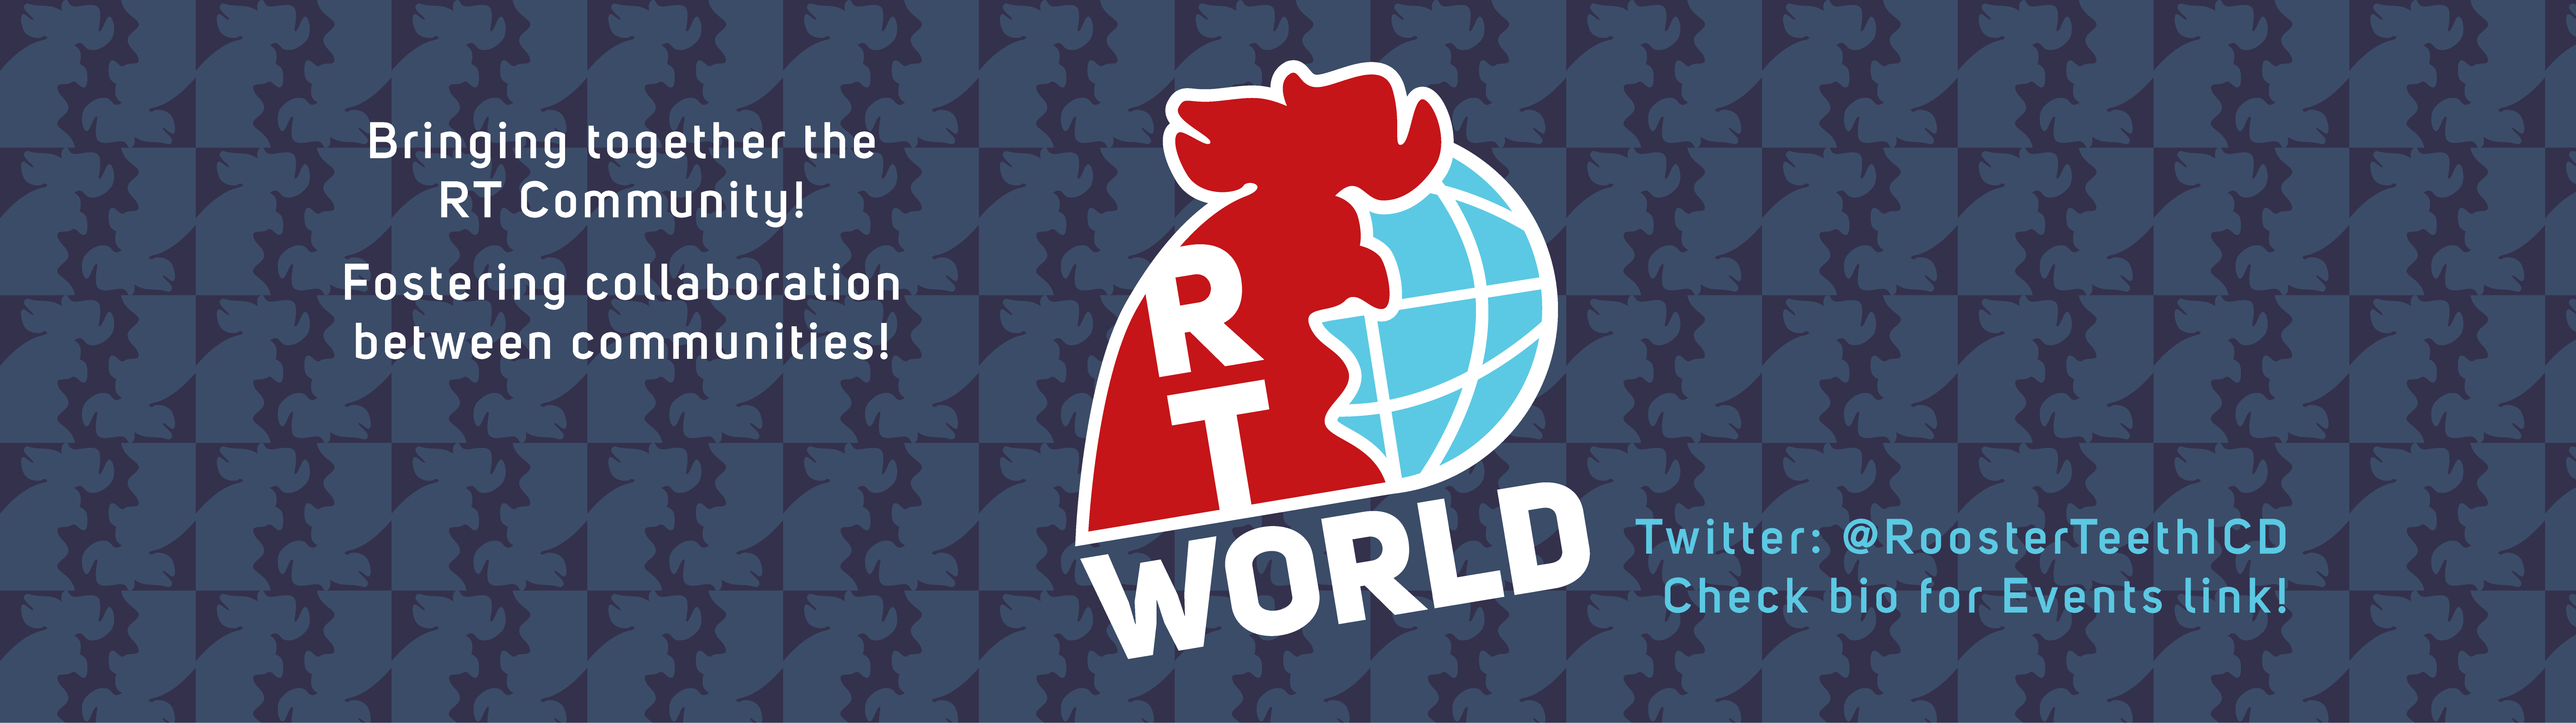 RT World Twitter Banner